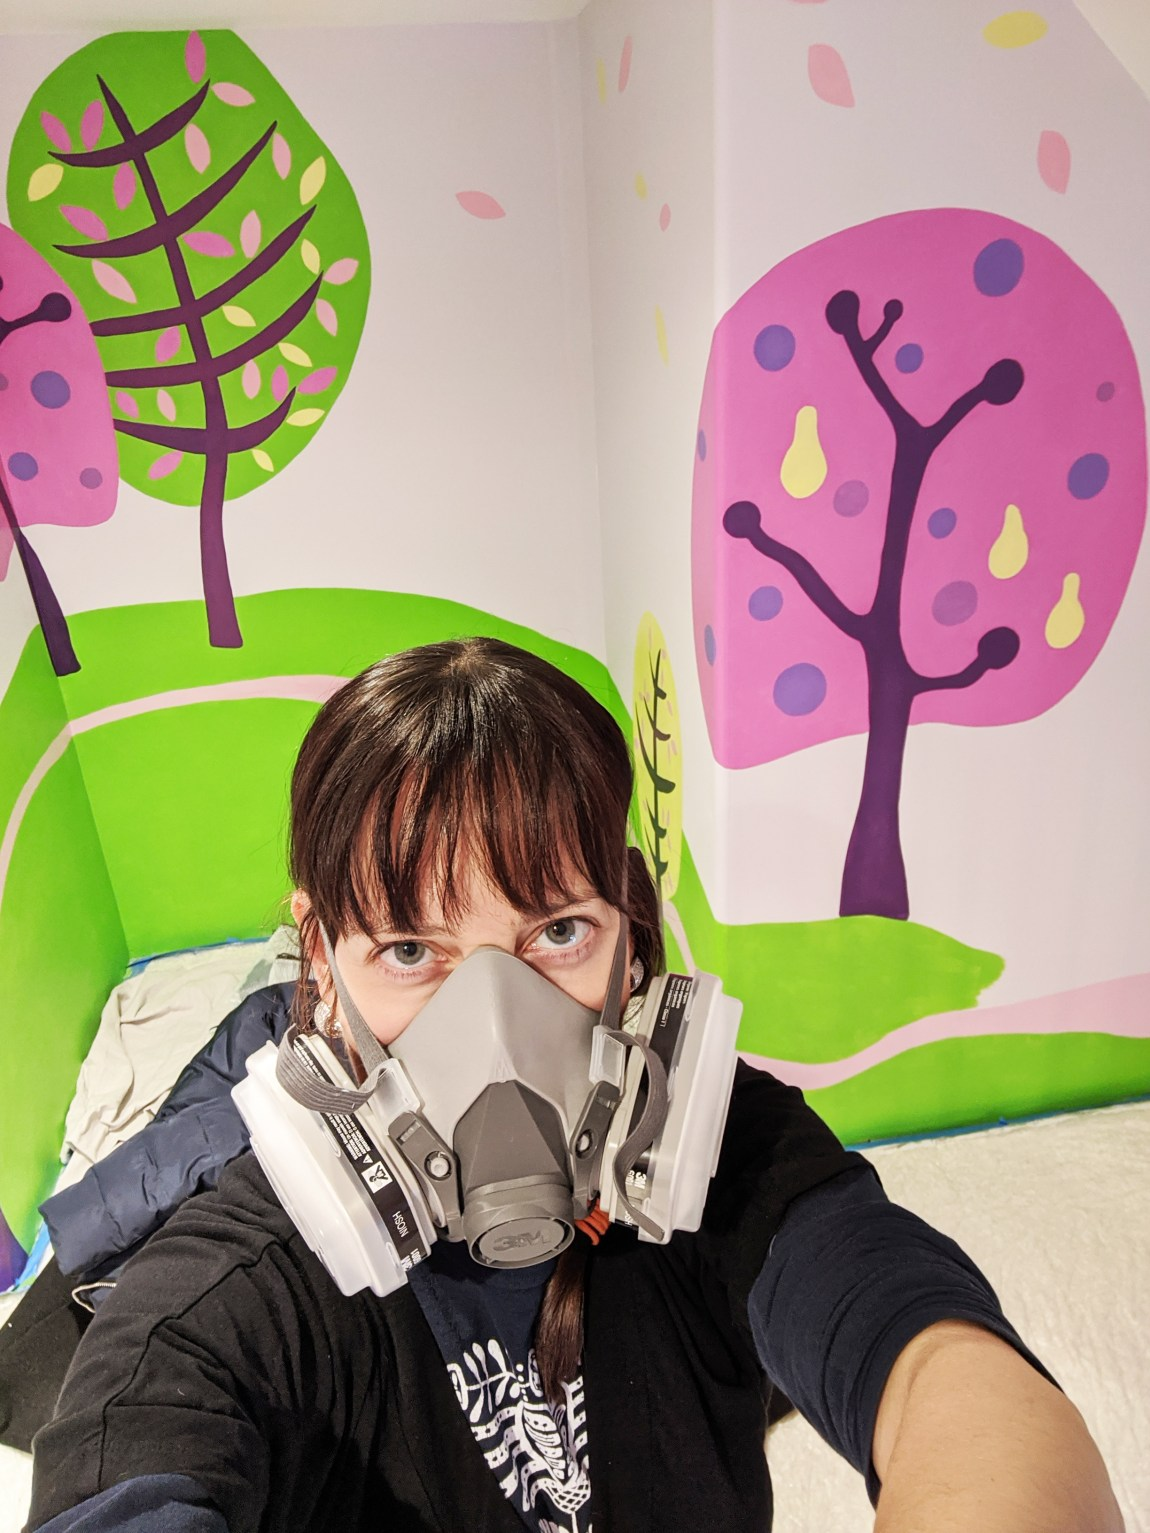 Laura Lynne Art working on a mural